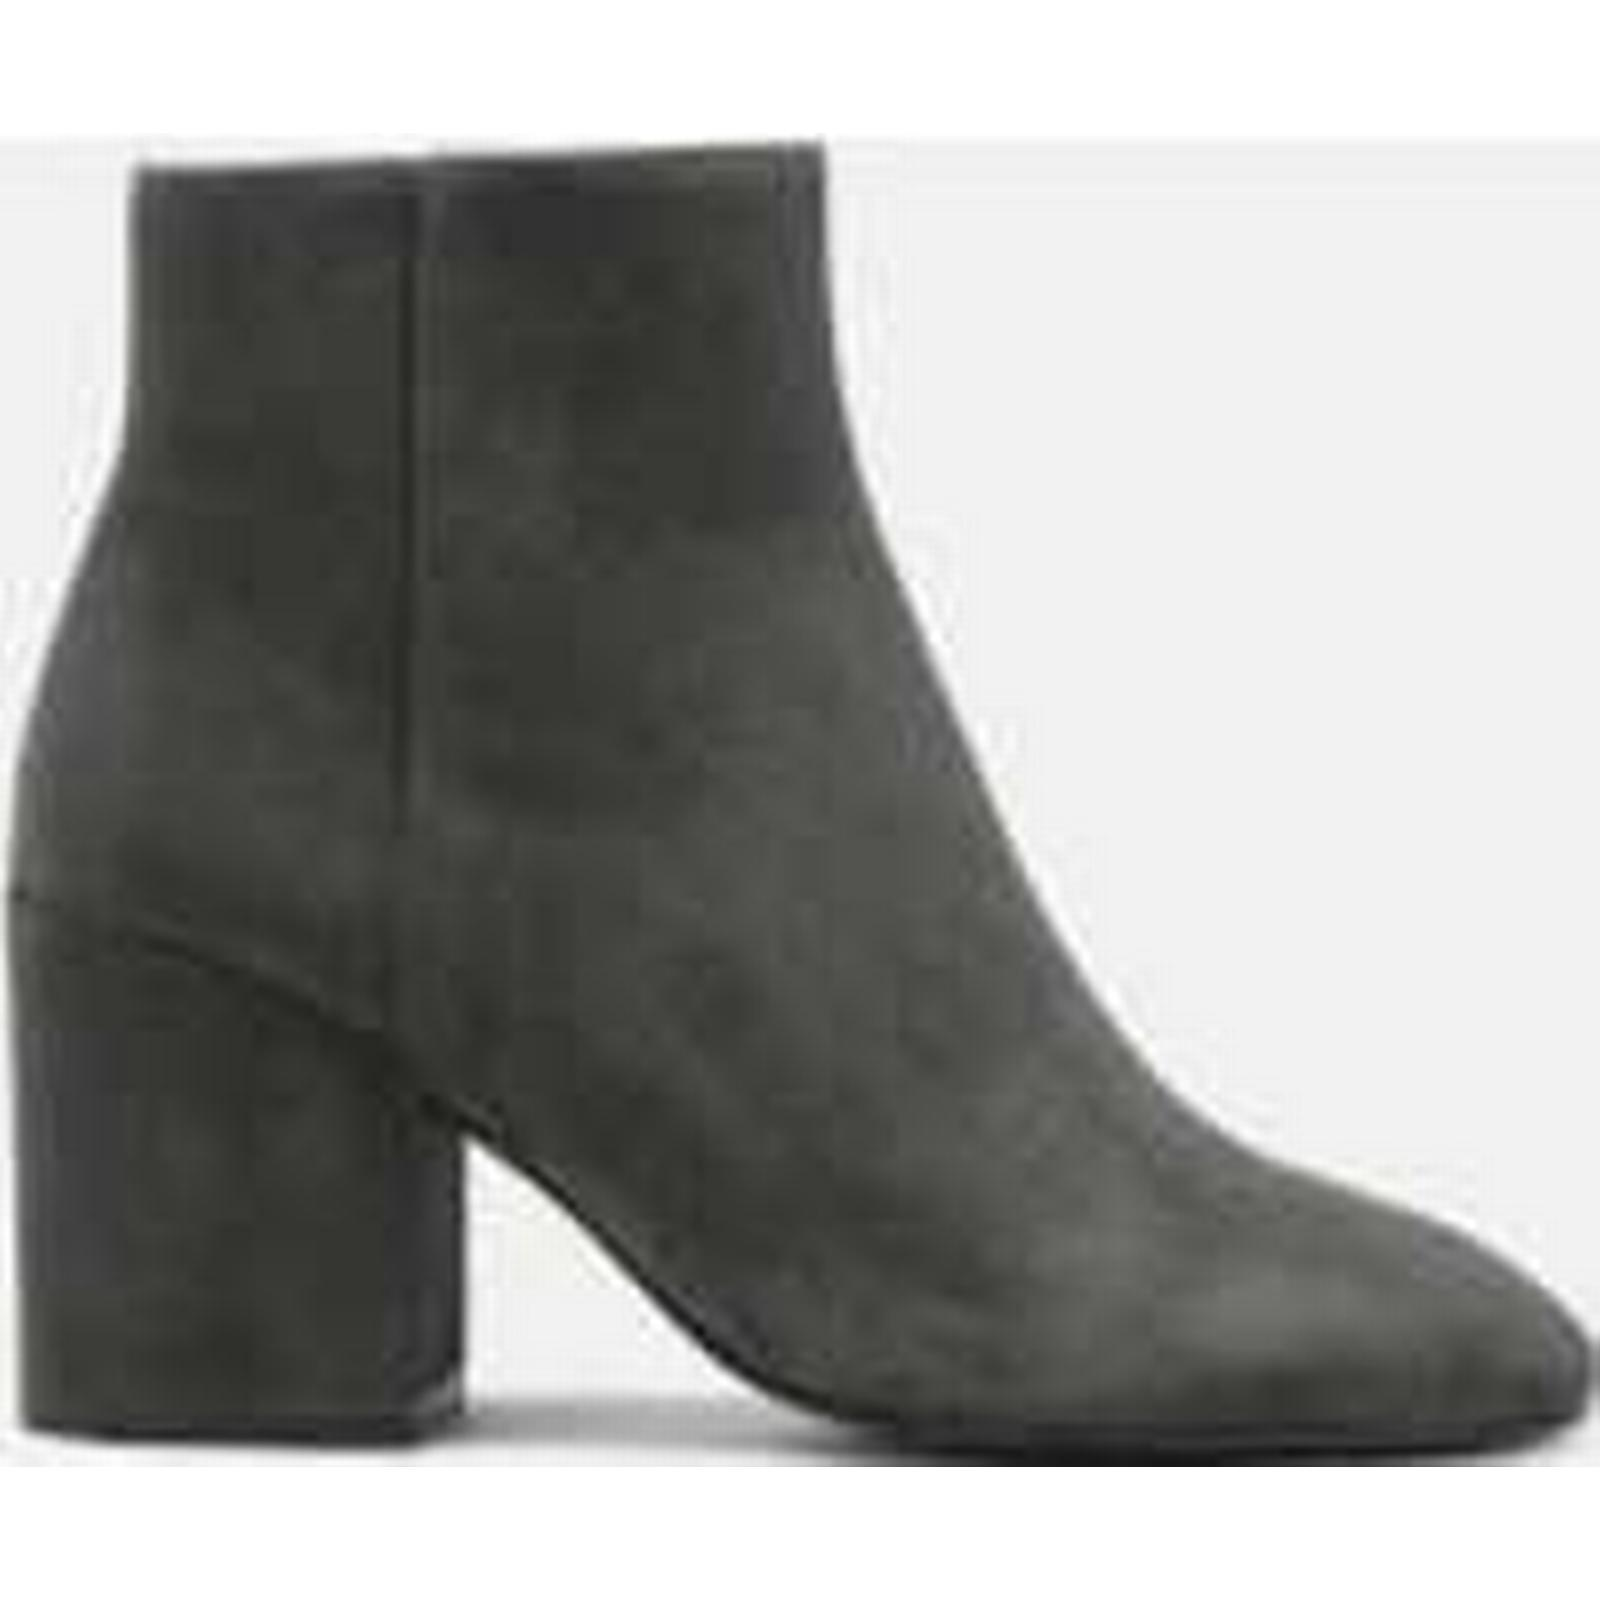 Ash Women's Boots Eden Suede Heeled Ankle Boots Women's - Bistro - UK 4 - Grey 6027ca